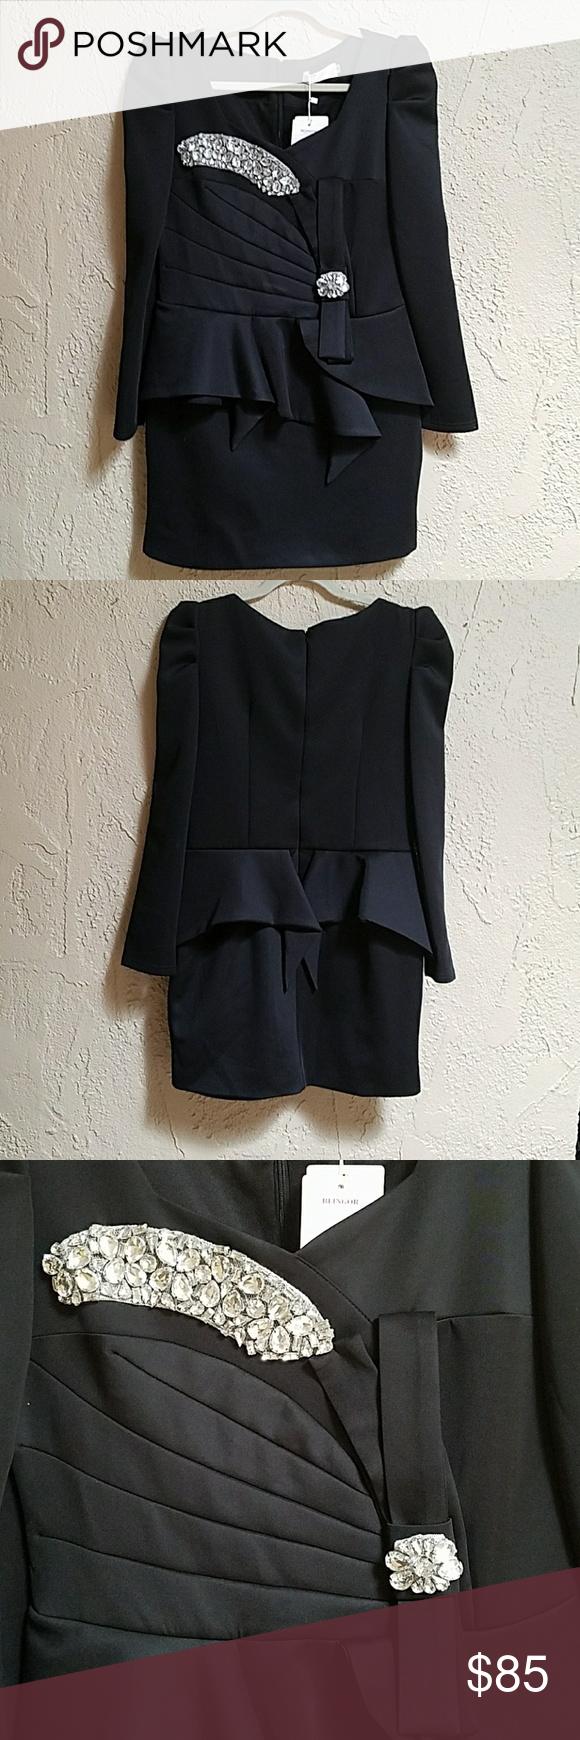 Vintage fancy black dress with rhinestones nwt vintage dresses